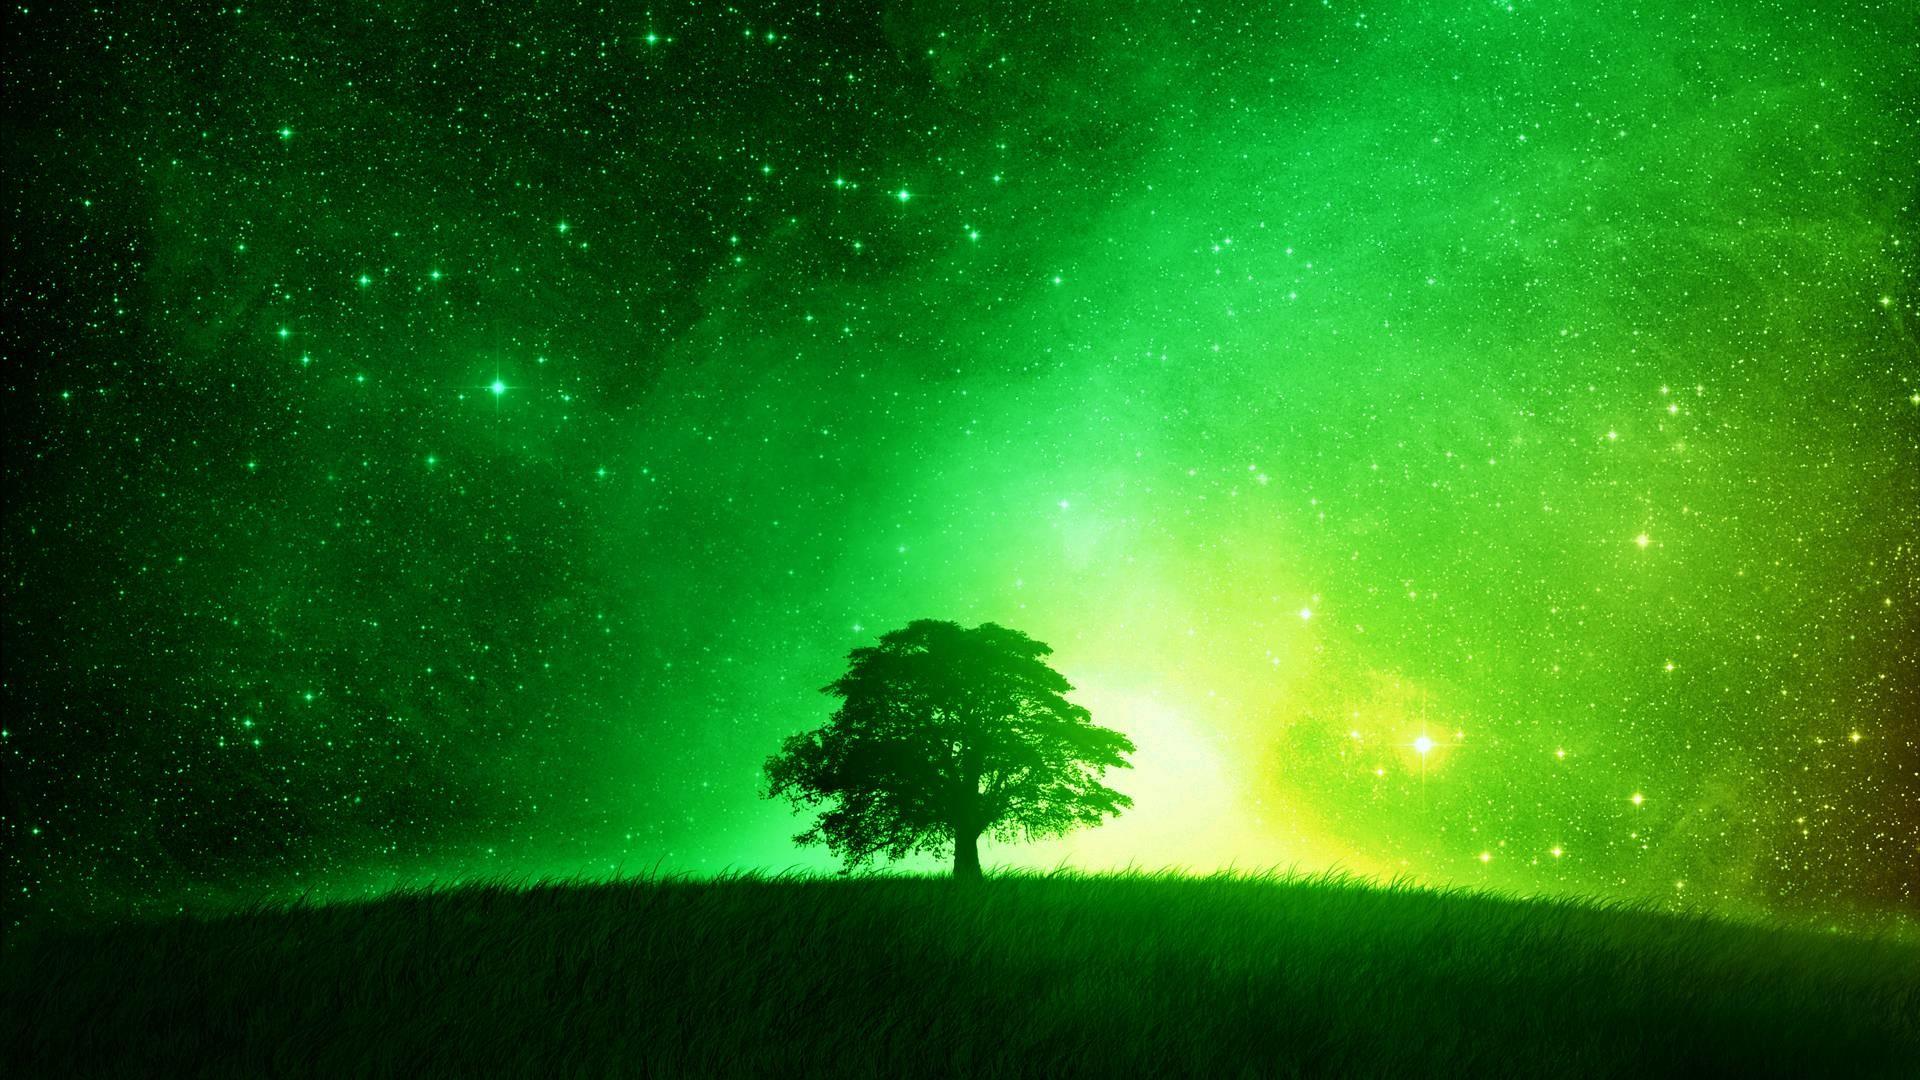 Green Wallpaper 1920×1080 HD